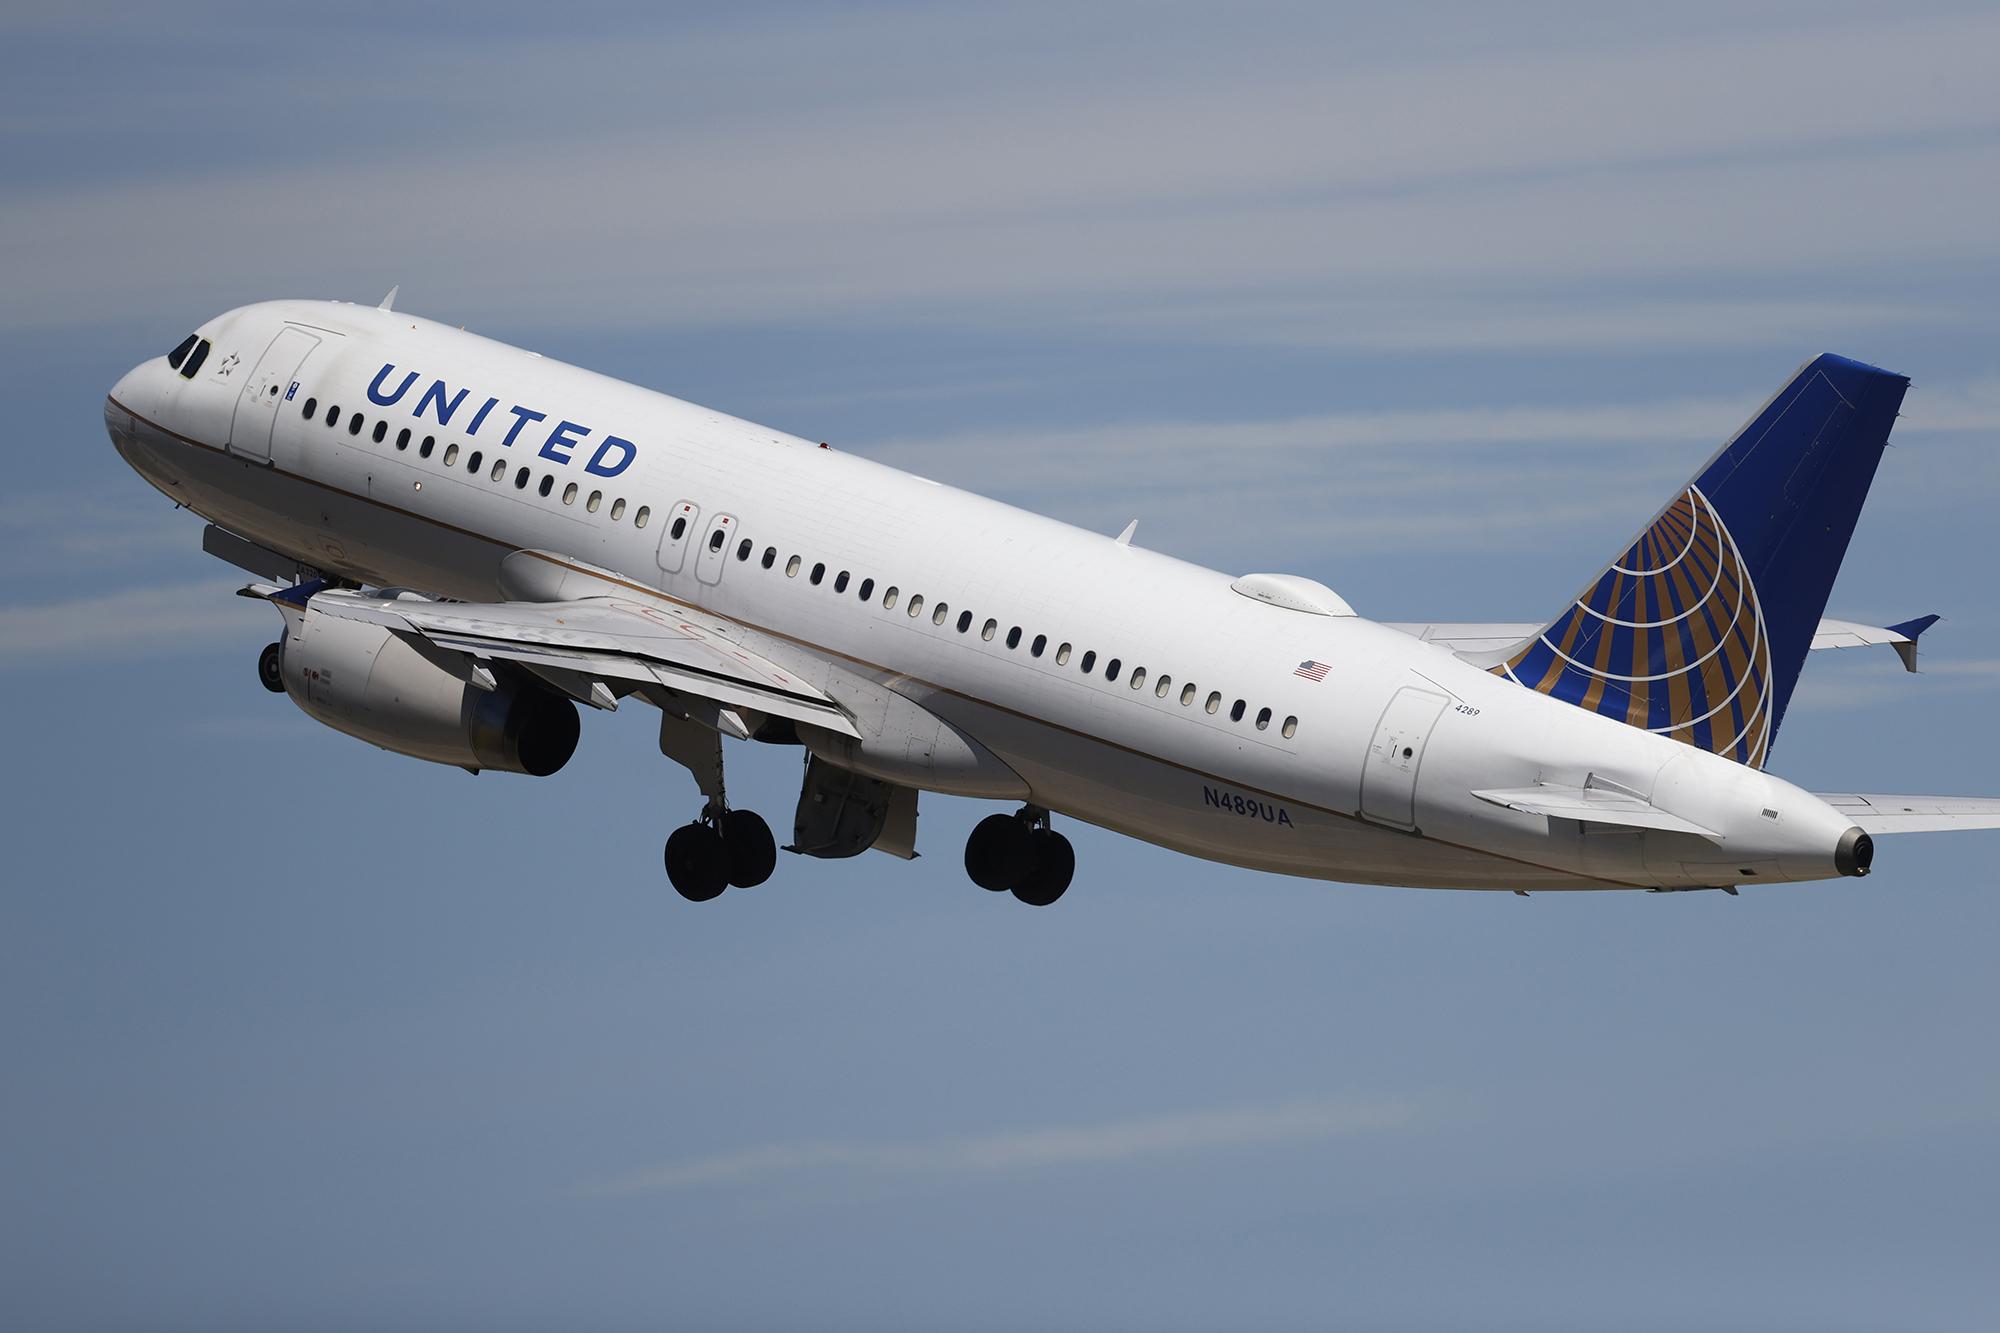 denver international airport,united airlines,r m